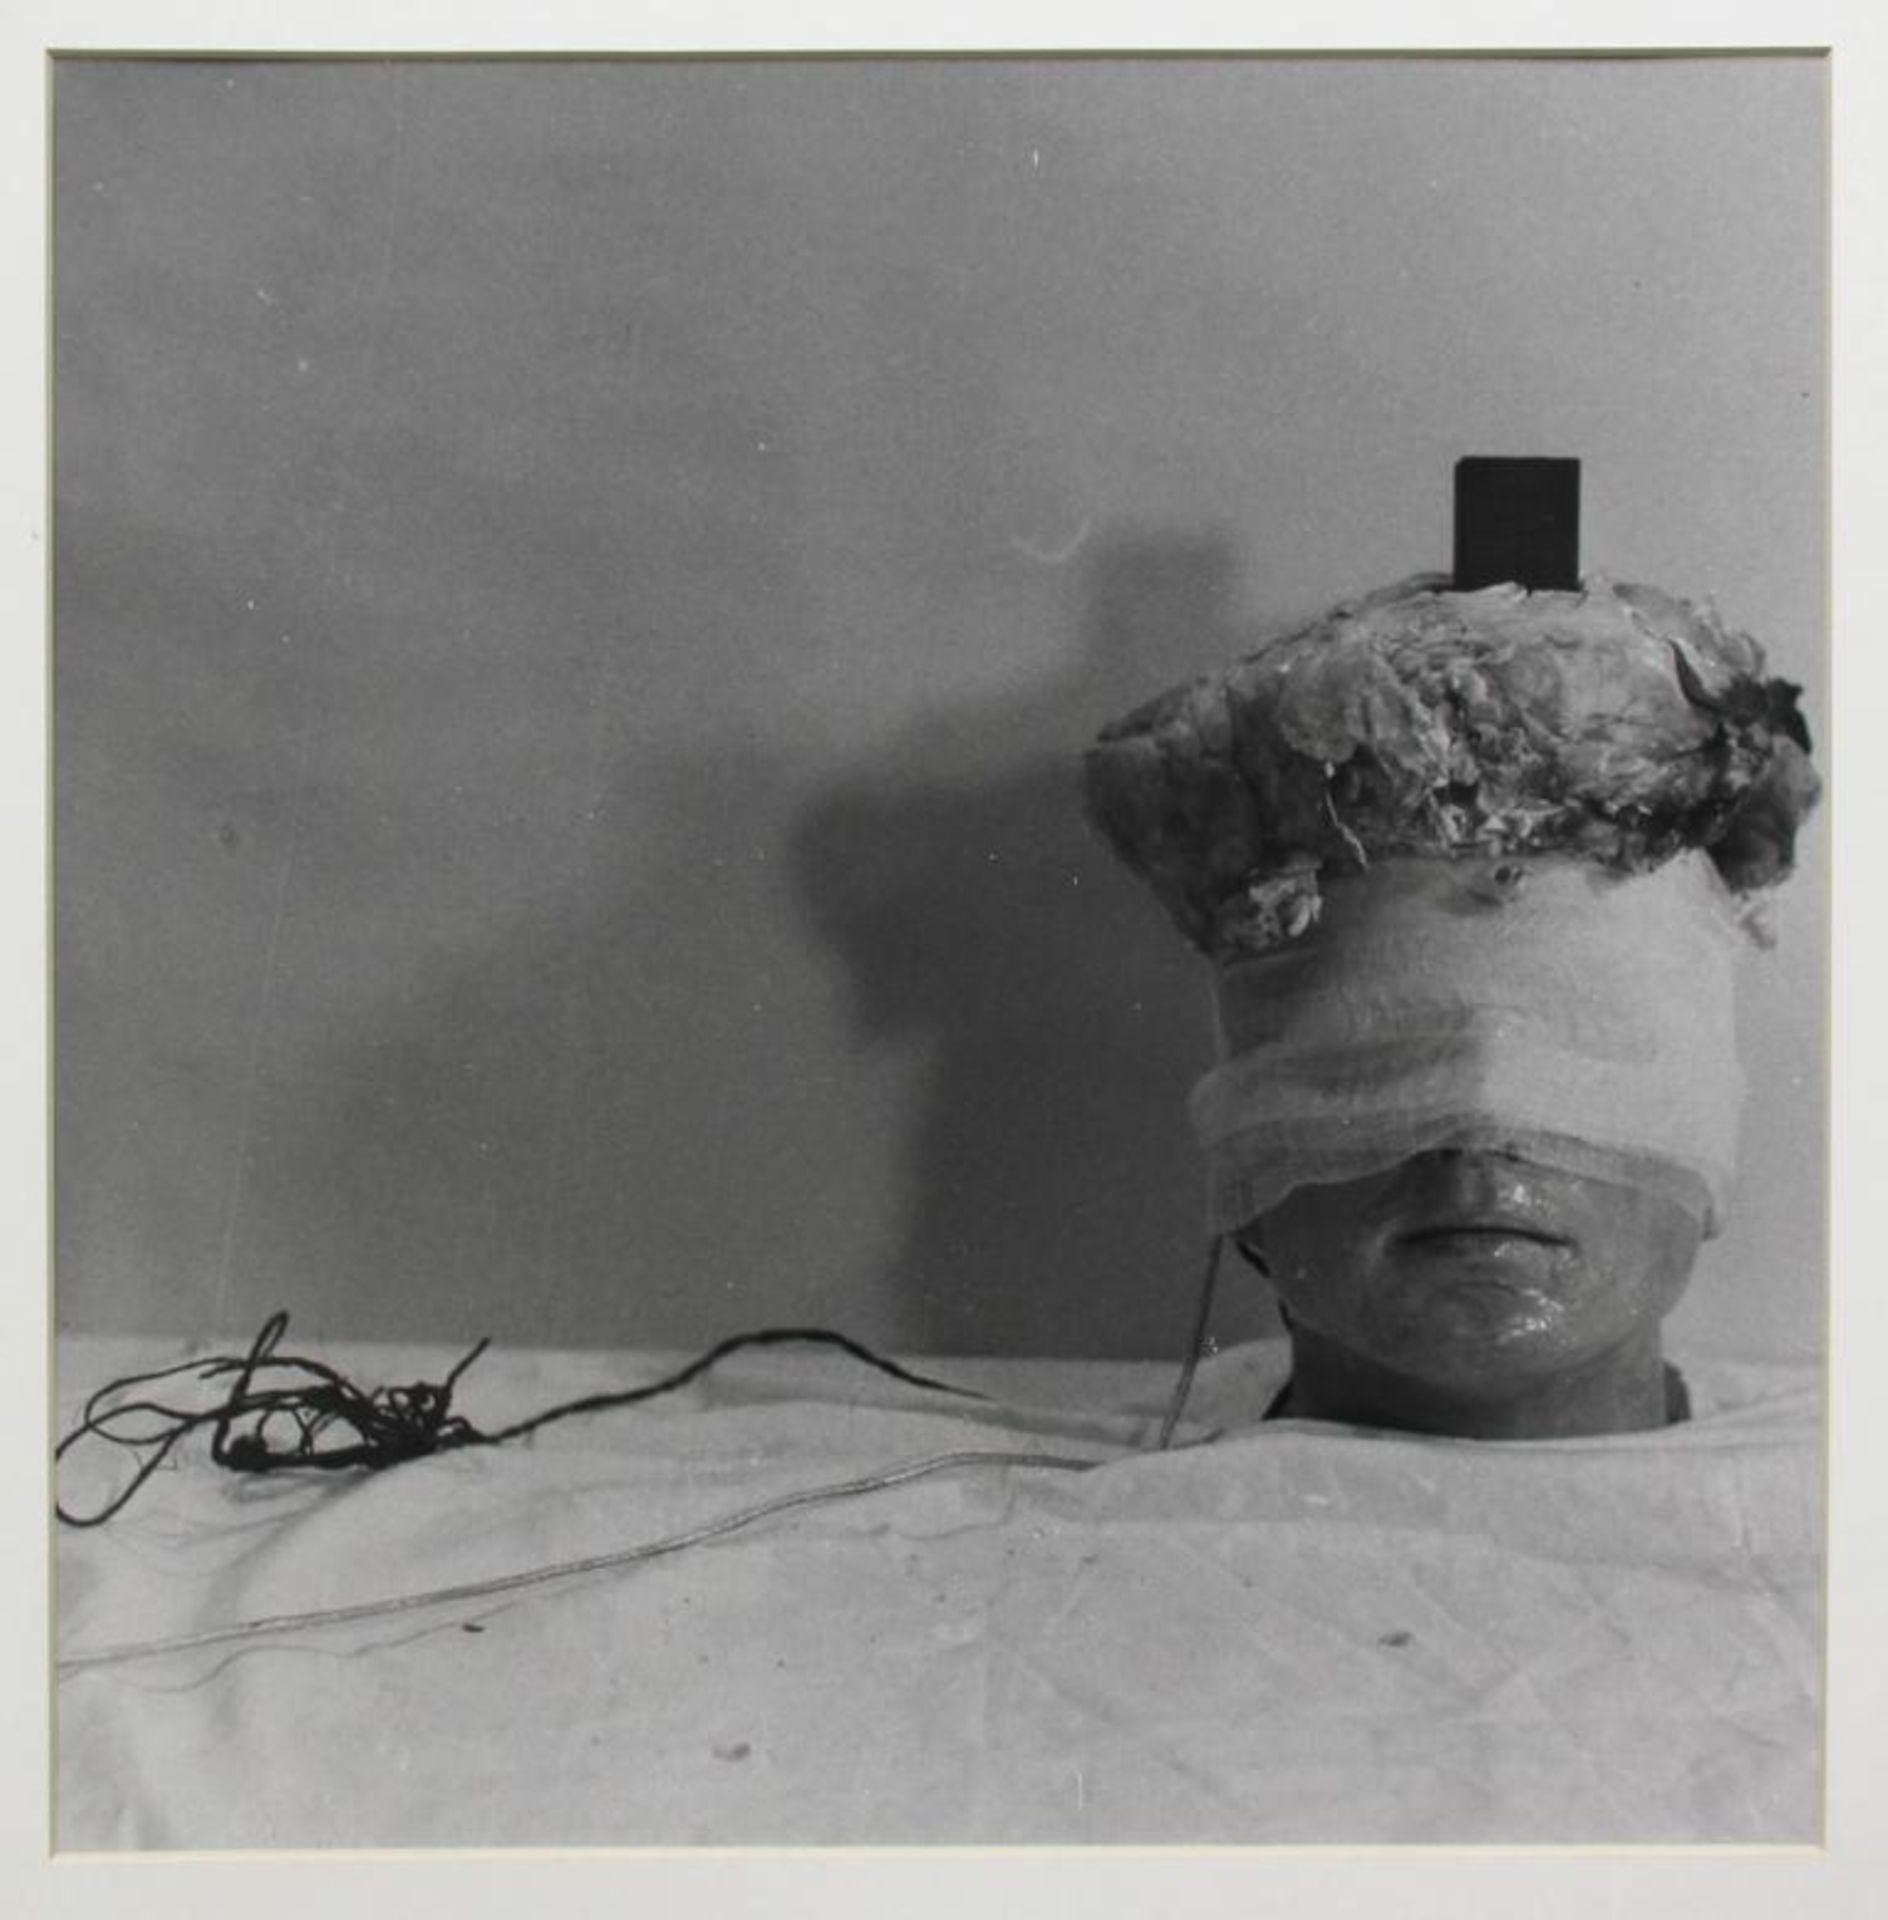 Los 55 - Schwarzkogler Rudolf (1940-1969) Ohne Titel Fotografie 34 x 34 cm